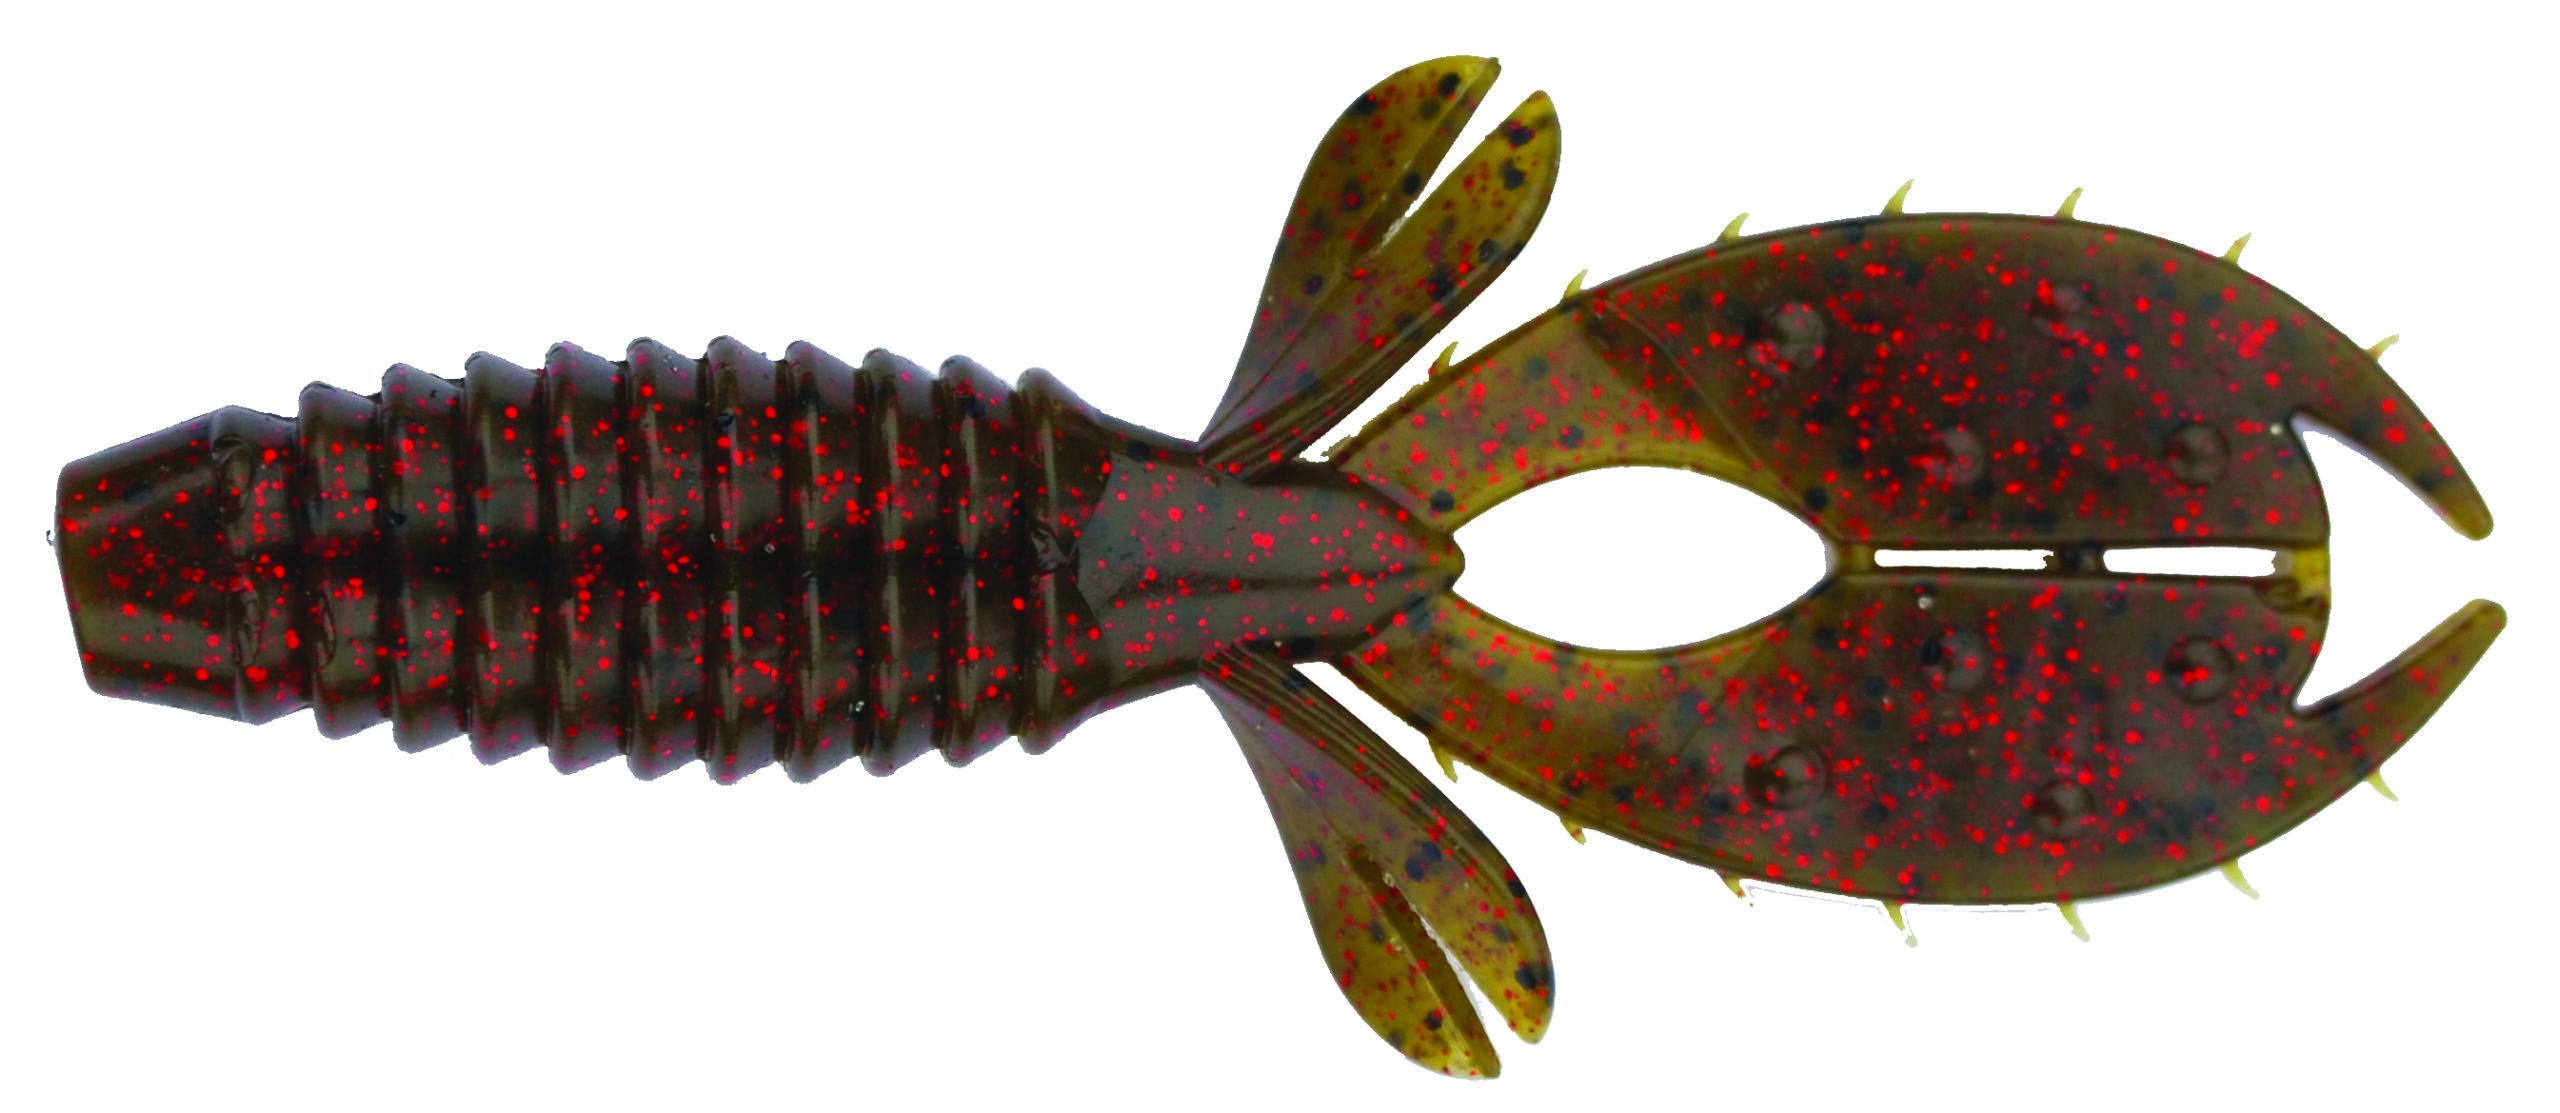 Big Bite Baits - YoMama - 4 inch - YO419 - GREEN PUMPKIN RED FLAKE